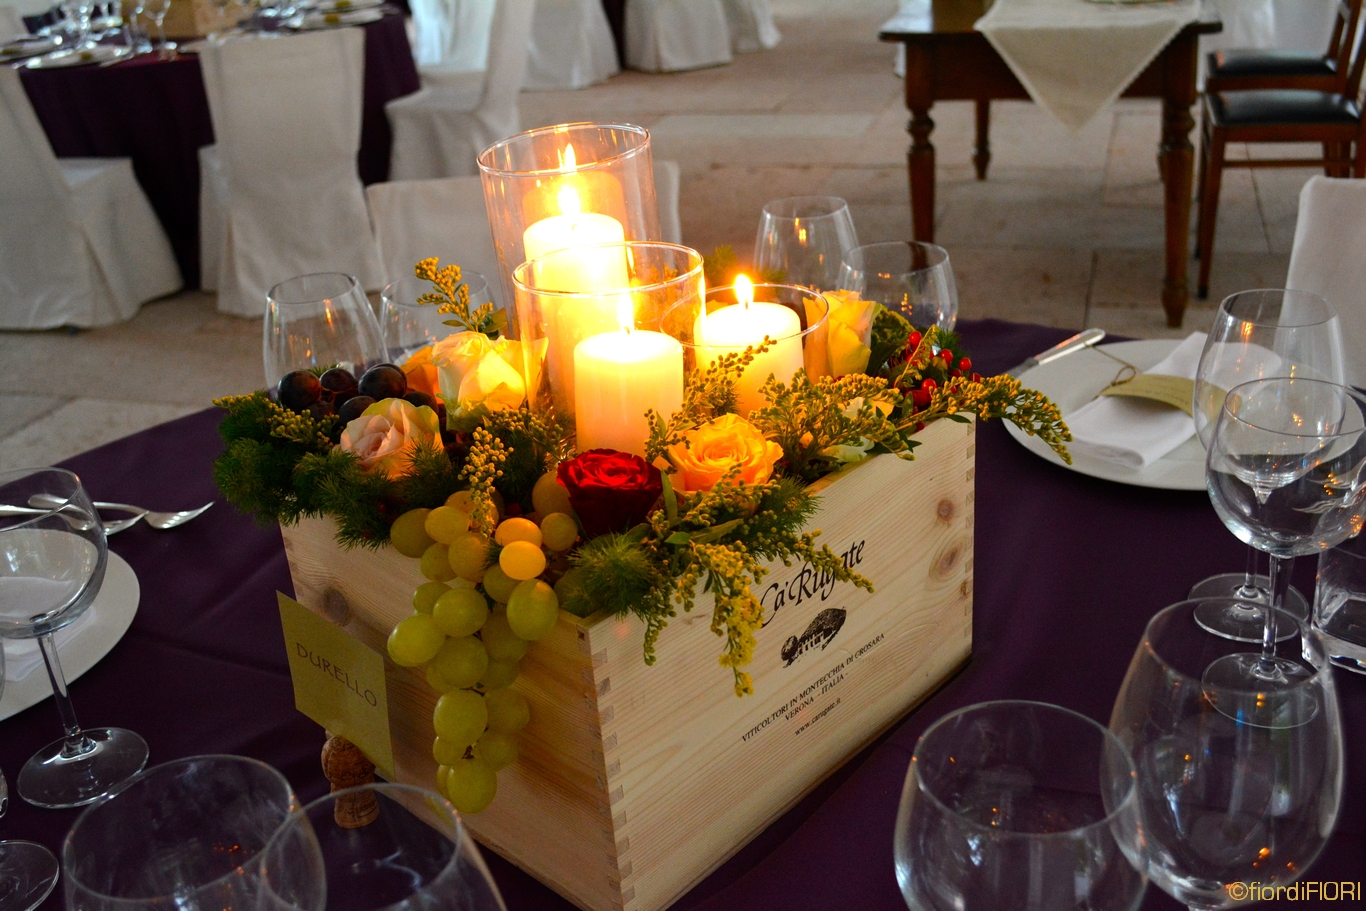 Matrimonio Tema Vino Colori : Fiordifiori matrimonio tema vino